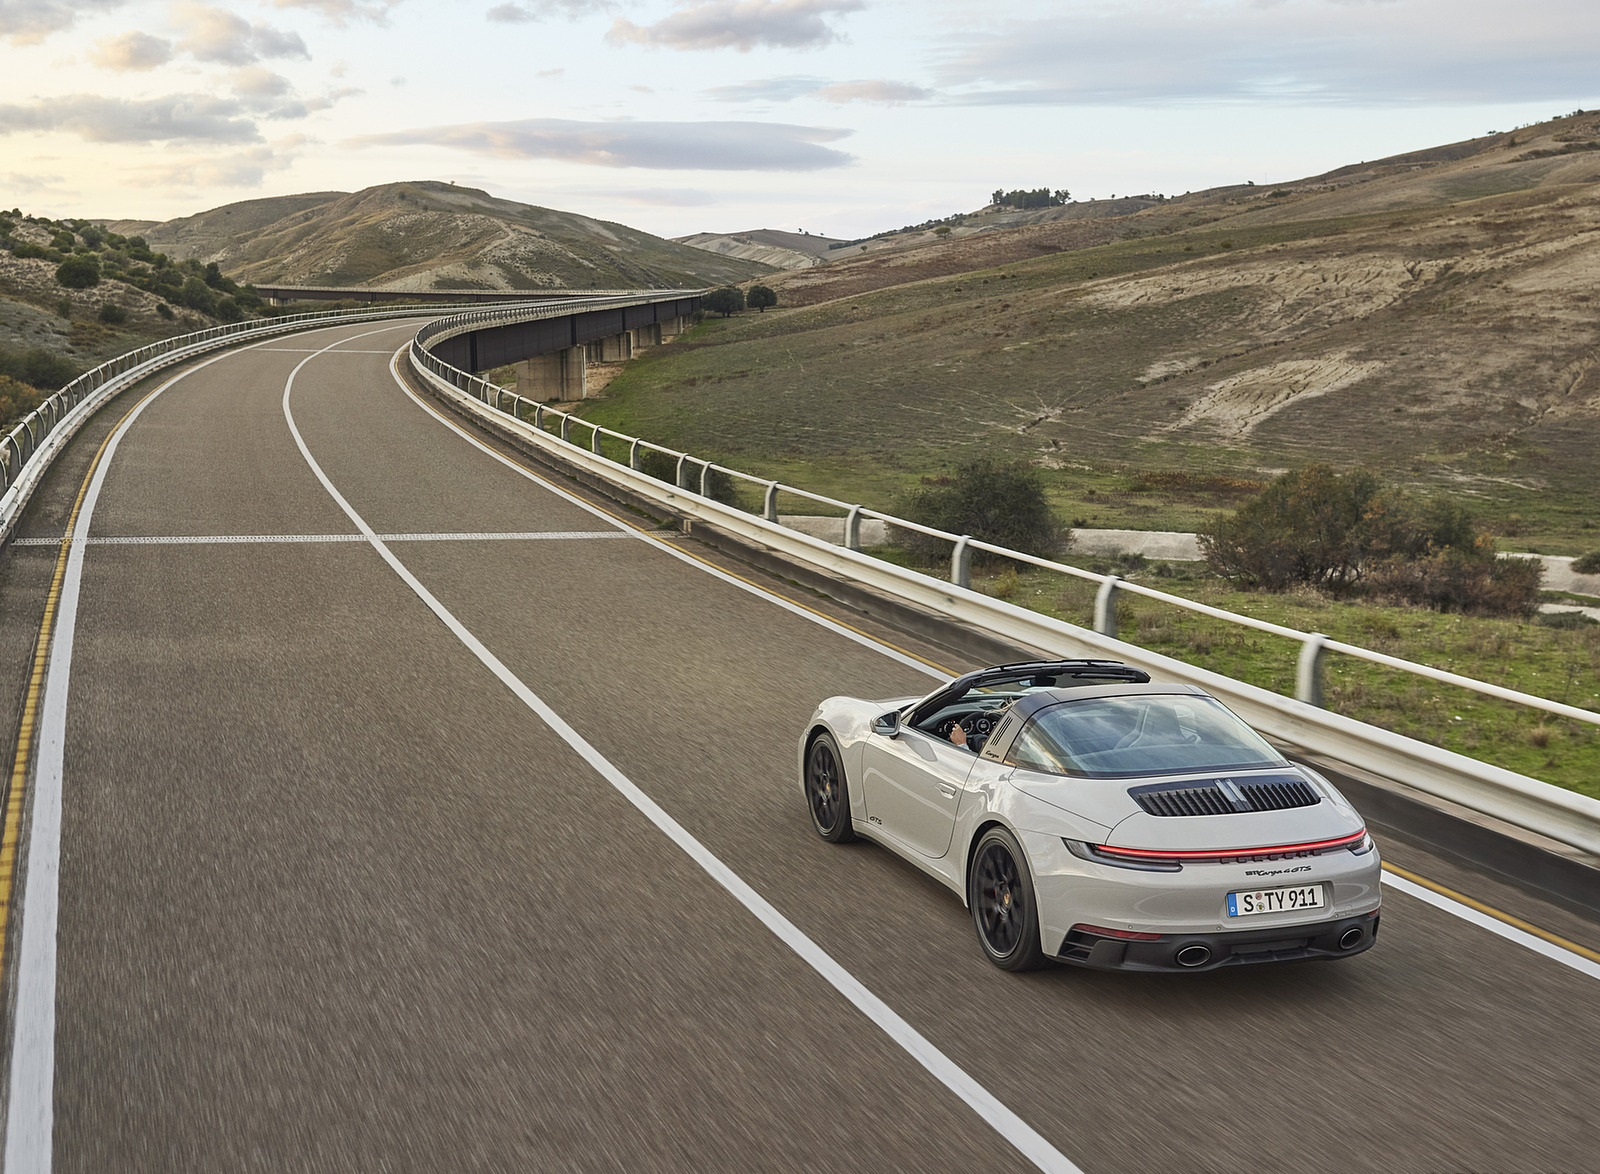 2022 Porsche 911 Targa 4 GTS Rear Three-Quarter Wallpapers (5)